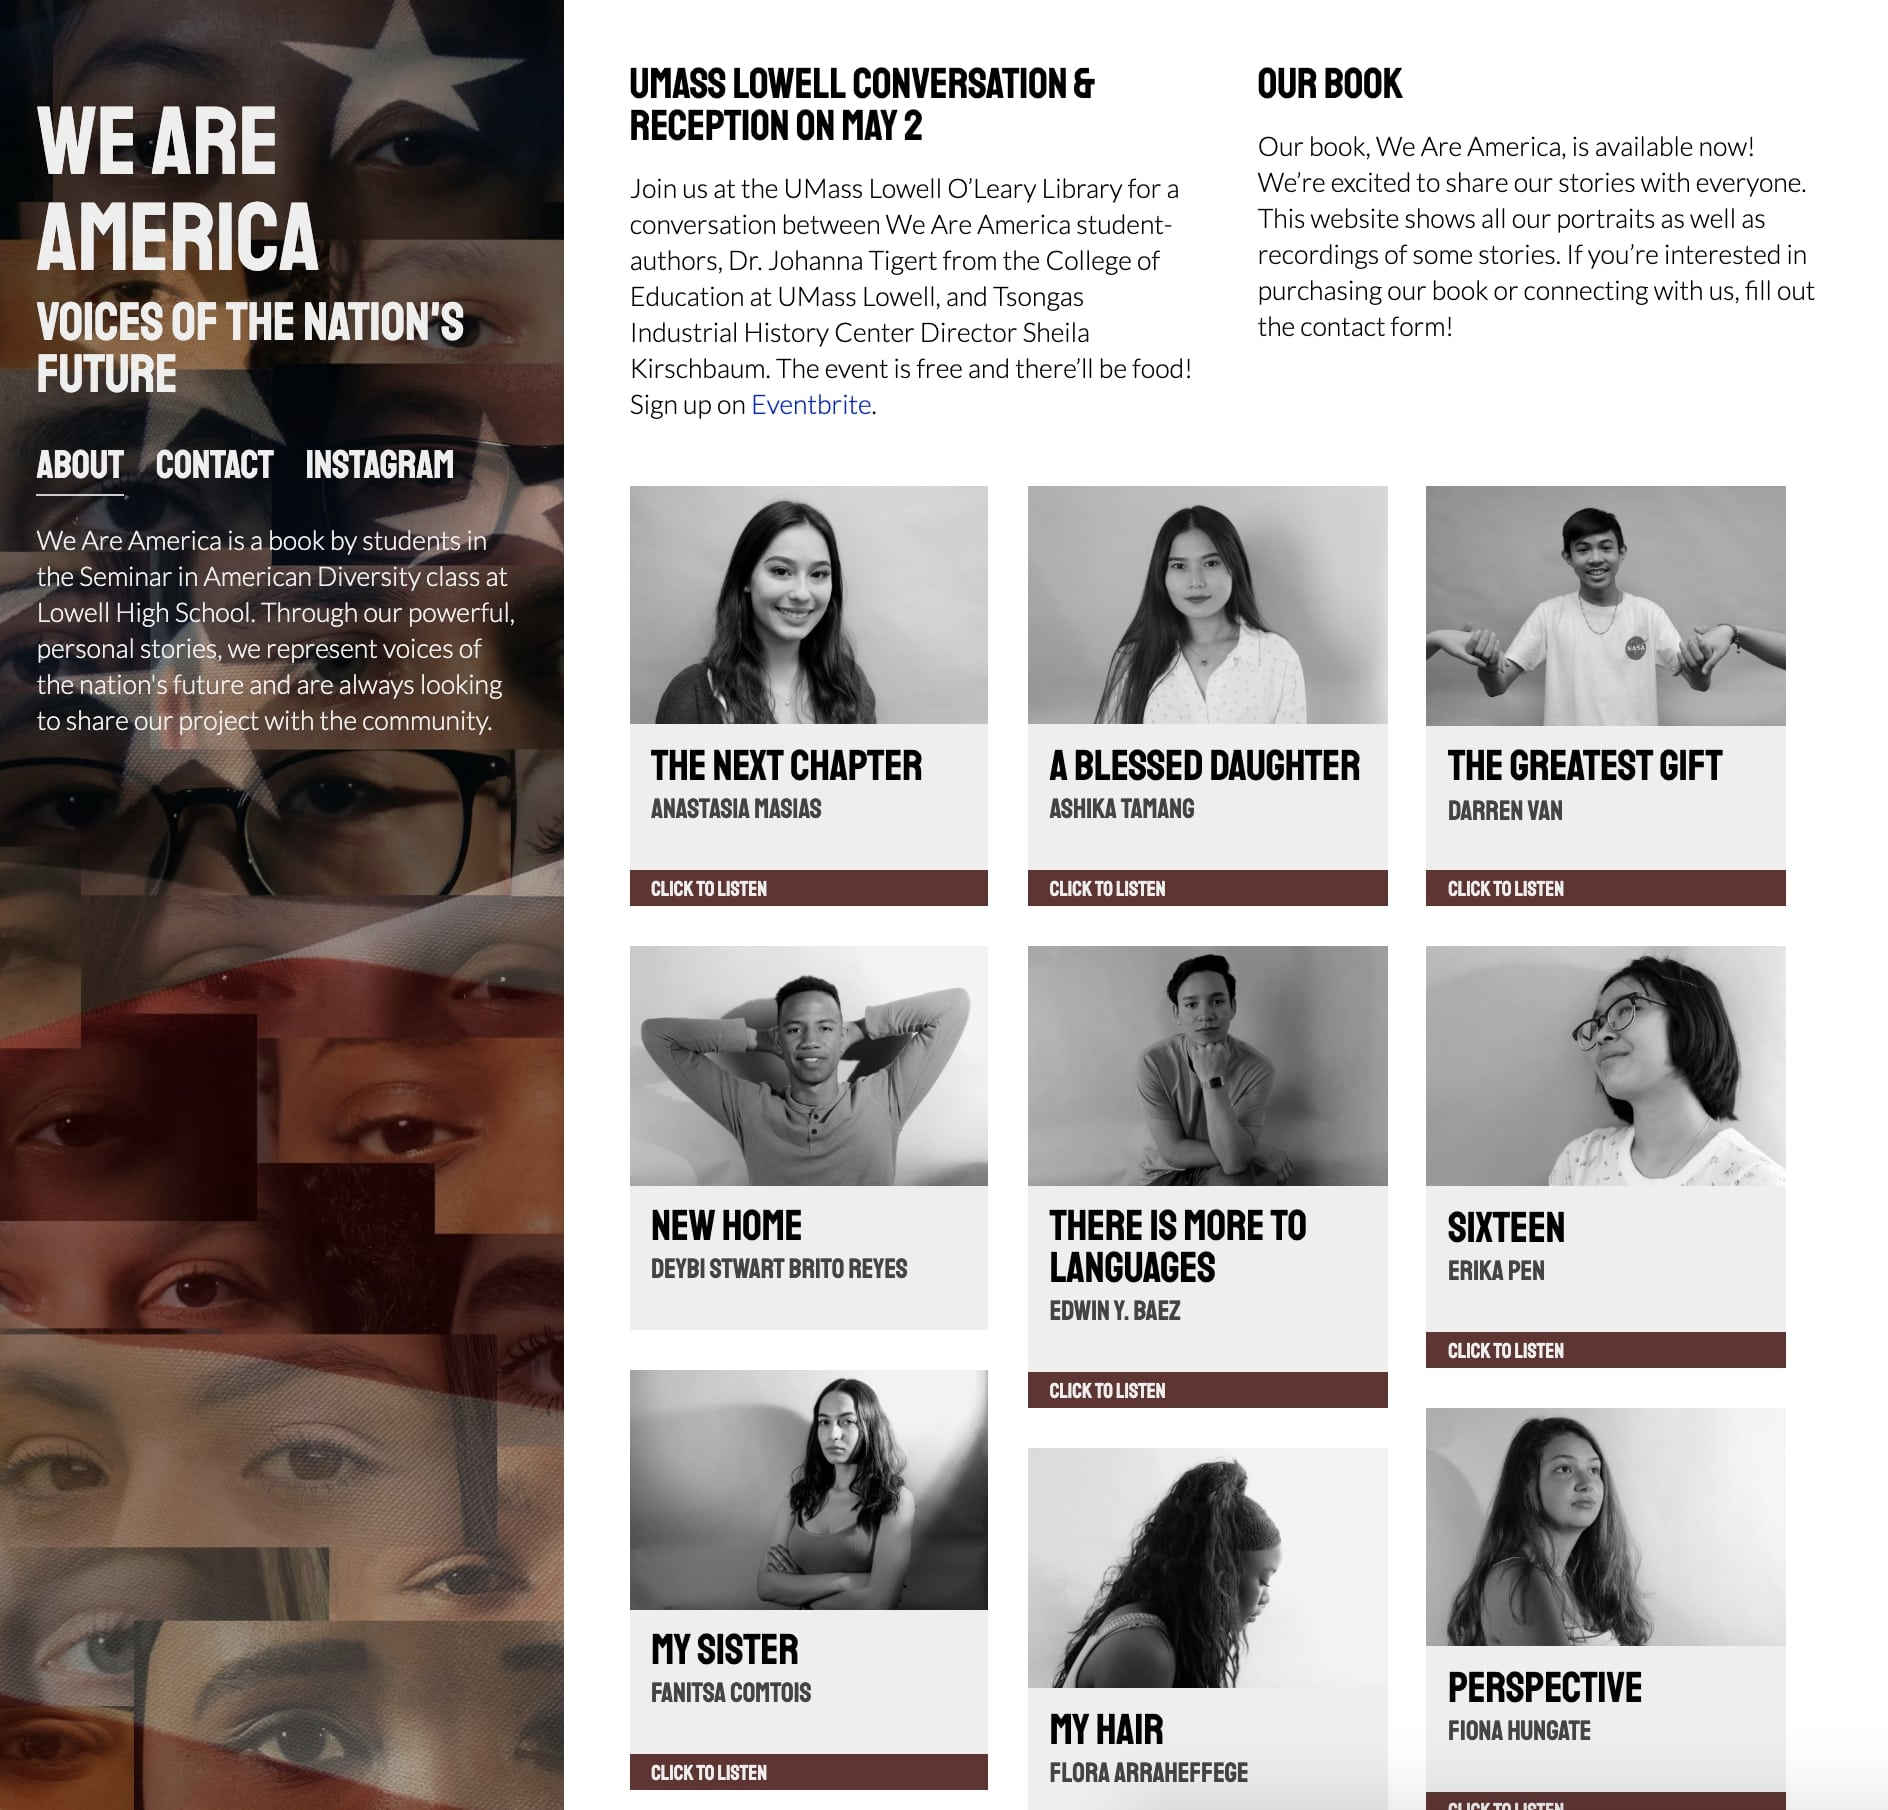 We Are America lhsweareamerica.com